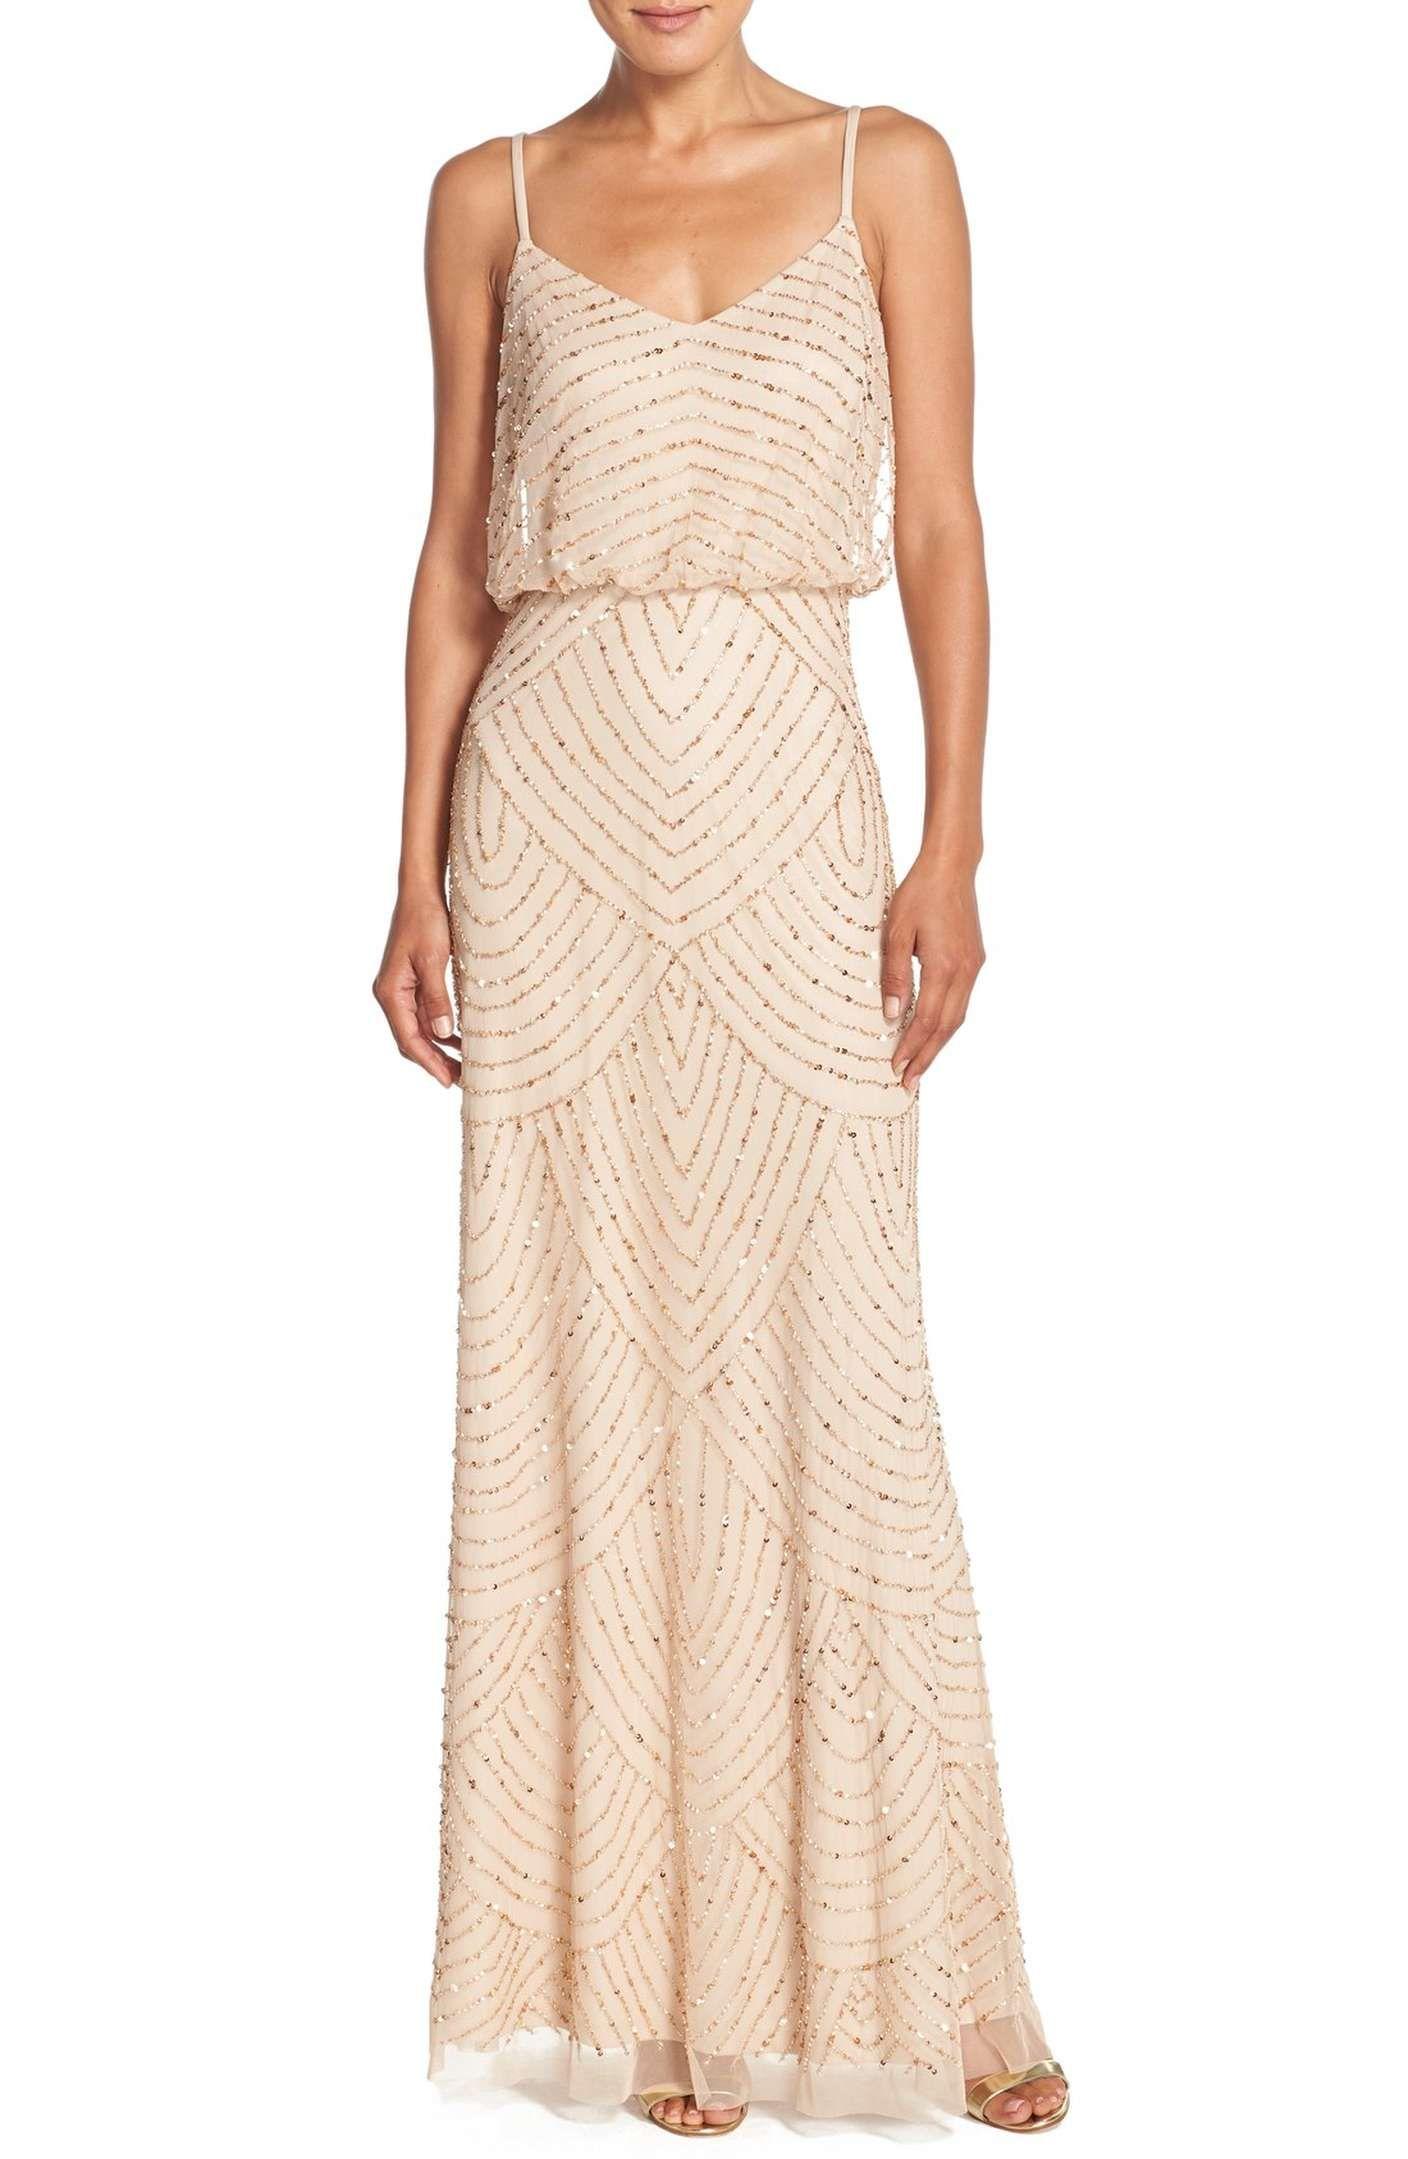 Mother of the Bride Dresses | Summer wedding guest dresses, Summer ...